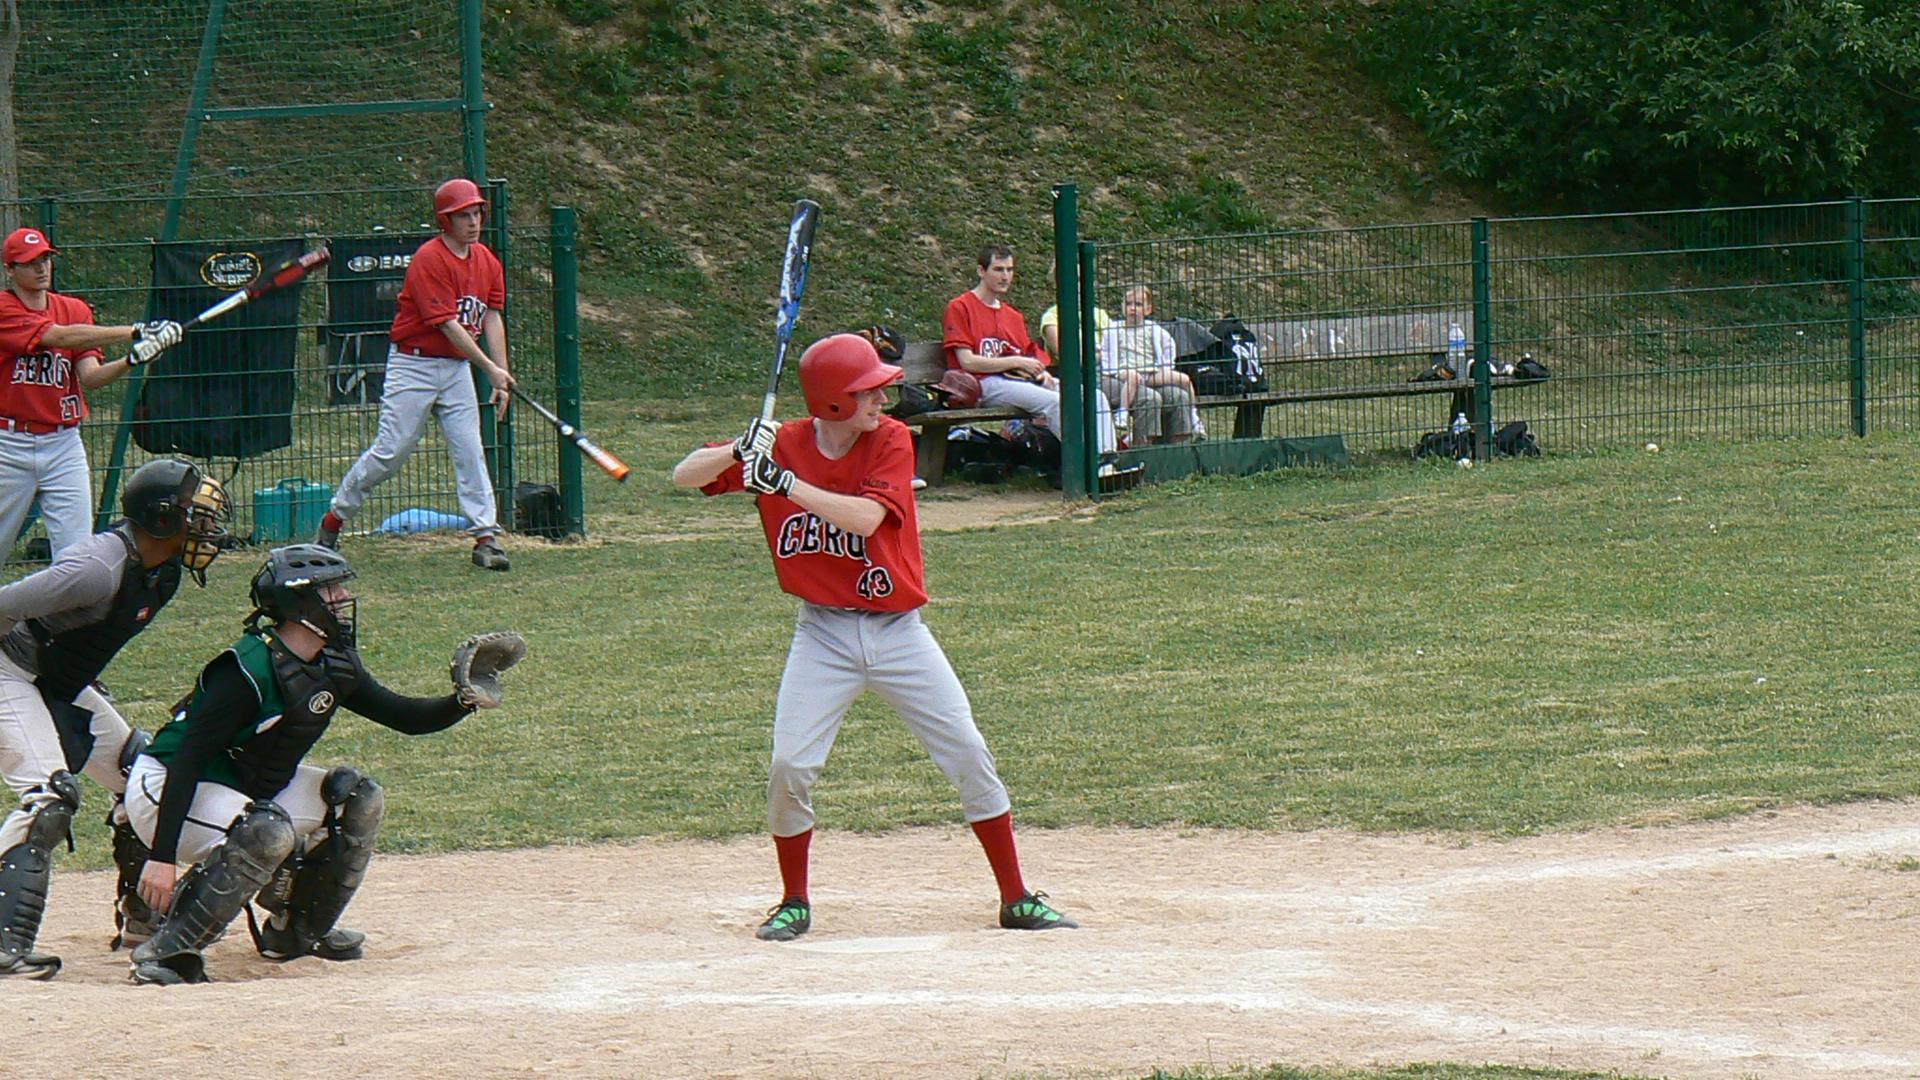 2011-05-08 vs Montigny (5)